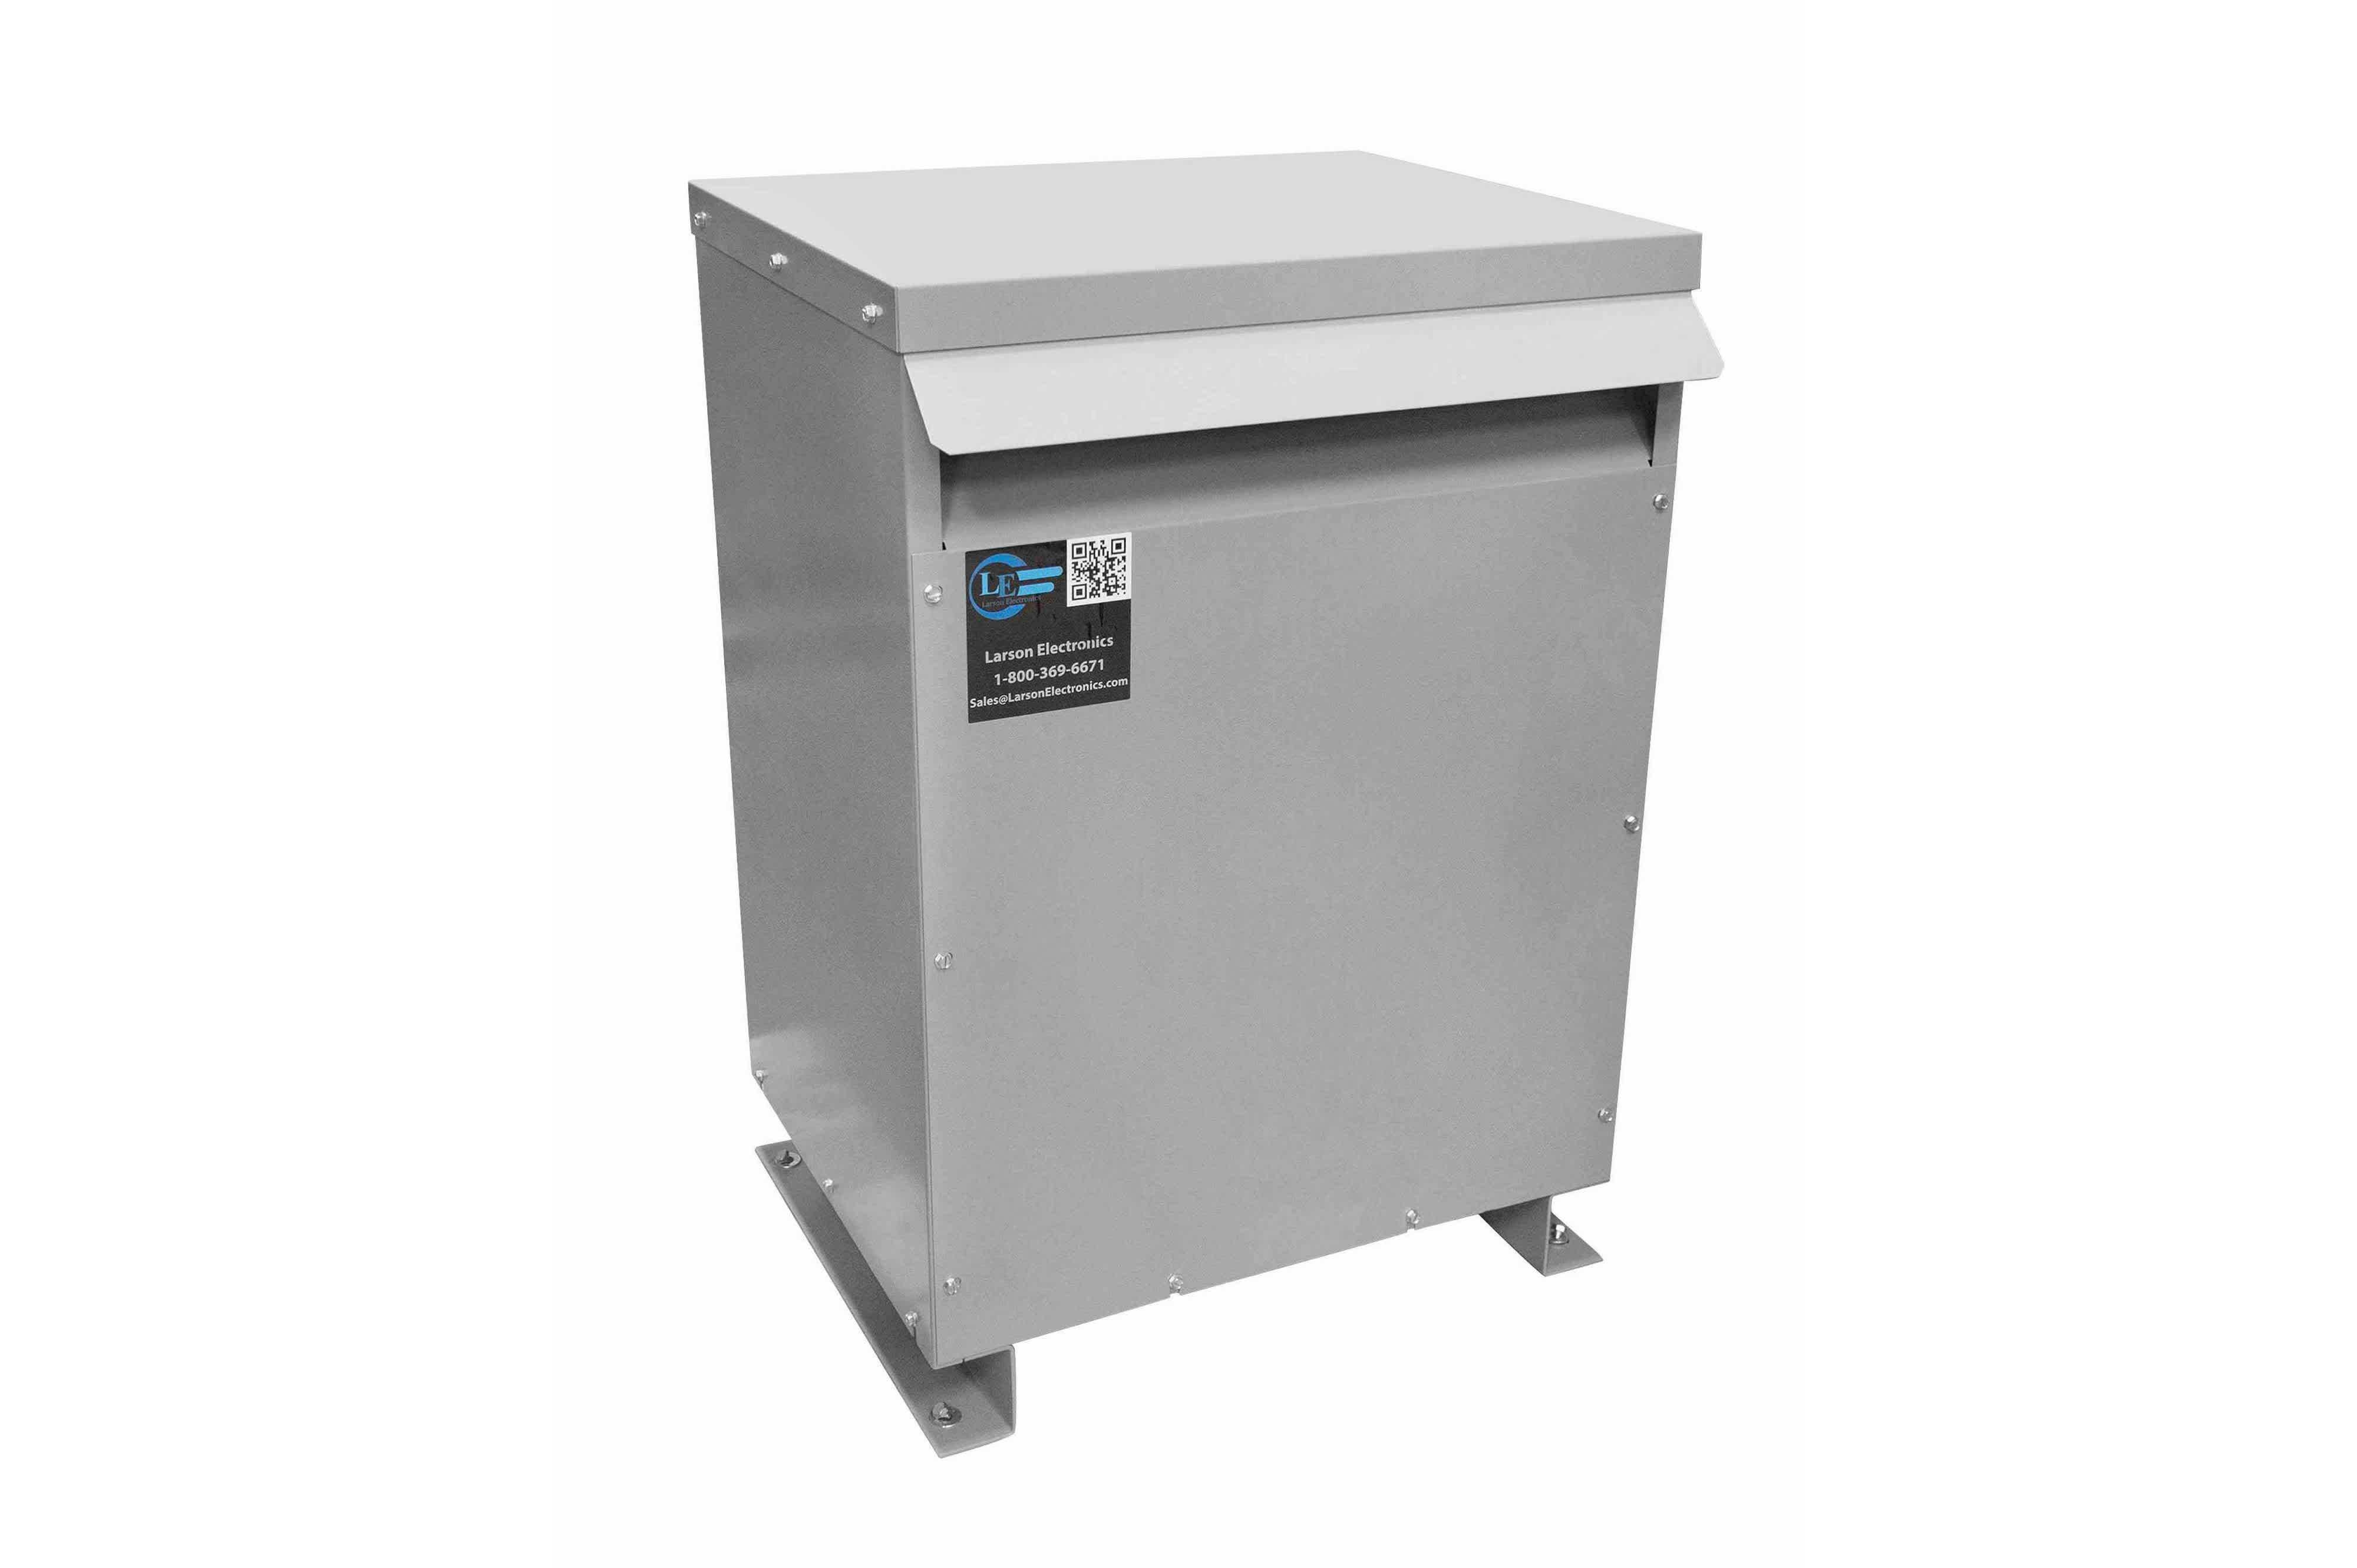 137.5 kVA 3PH Isolation Transformer, 220V Wye Primary, 480V Delta Secondary, N3R, Ventilated, 60 Hz